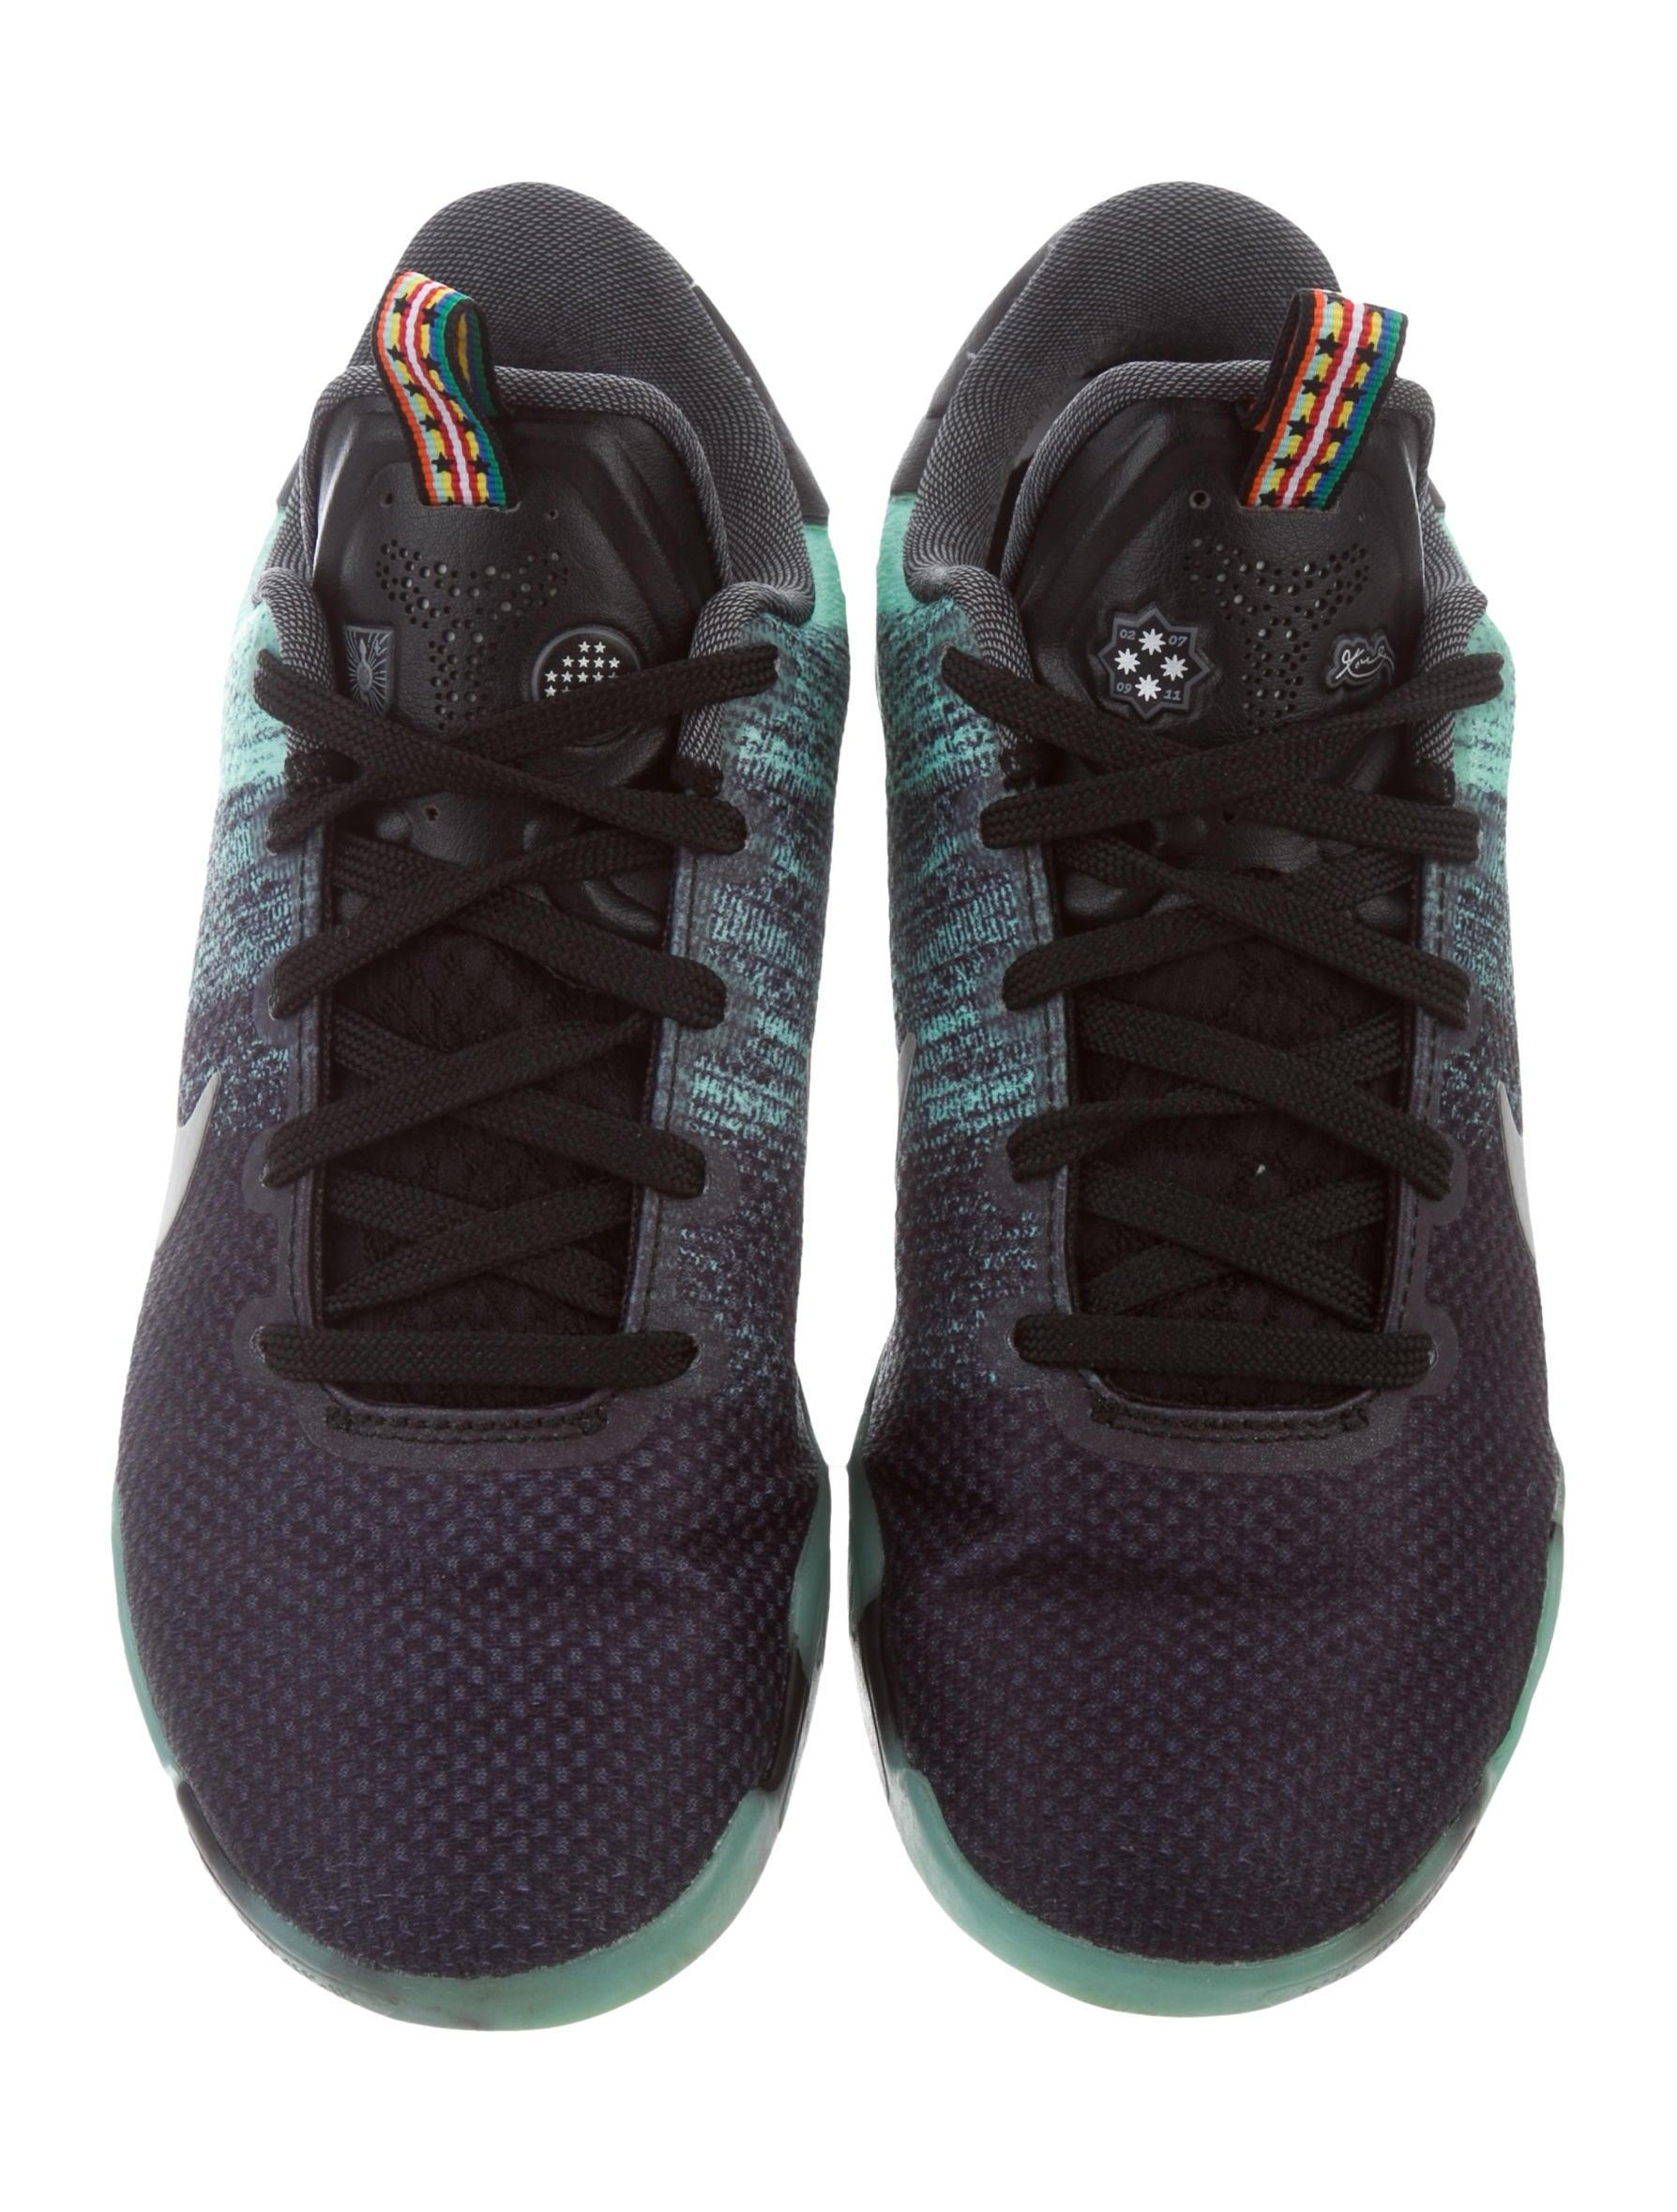 23a6b9db95c ... big boys  boys kobe xi elite sneakers